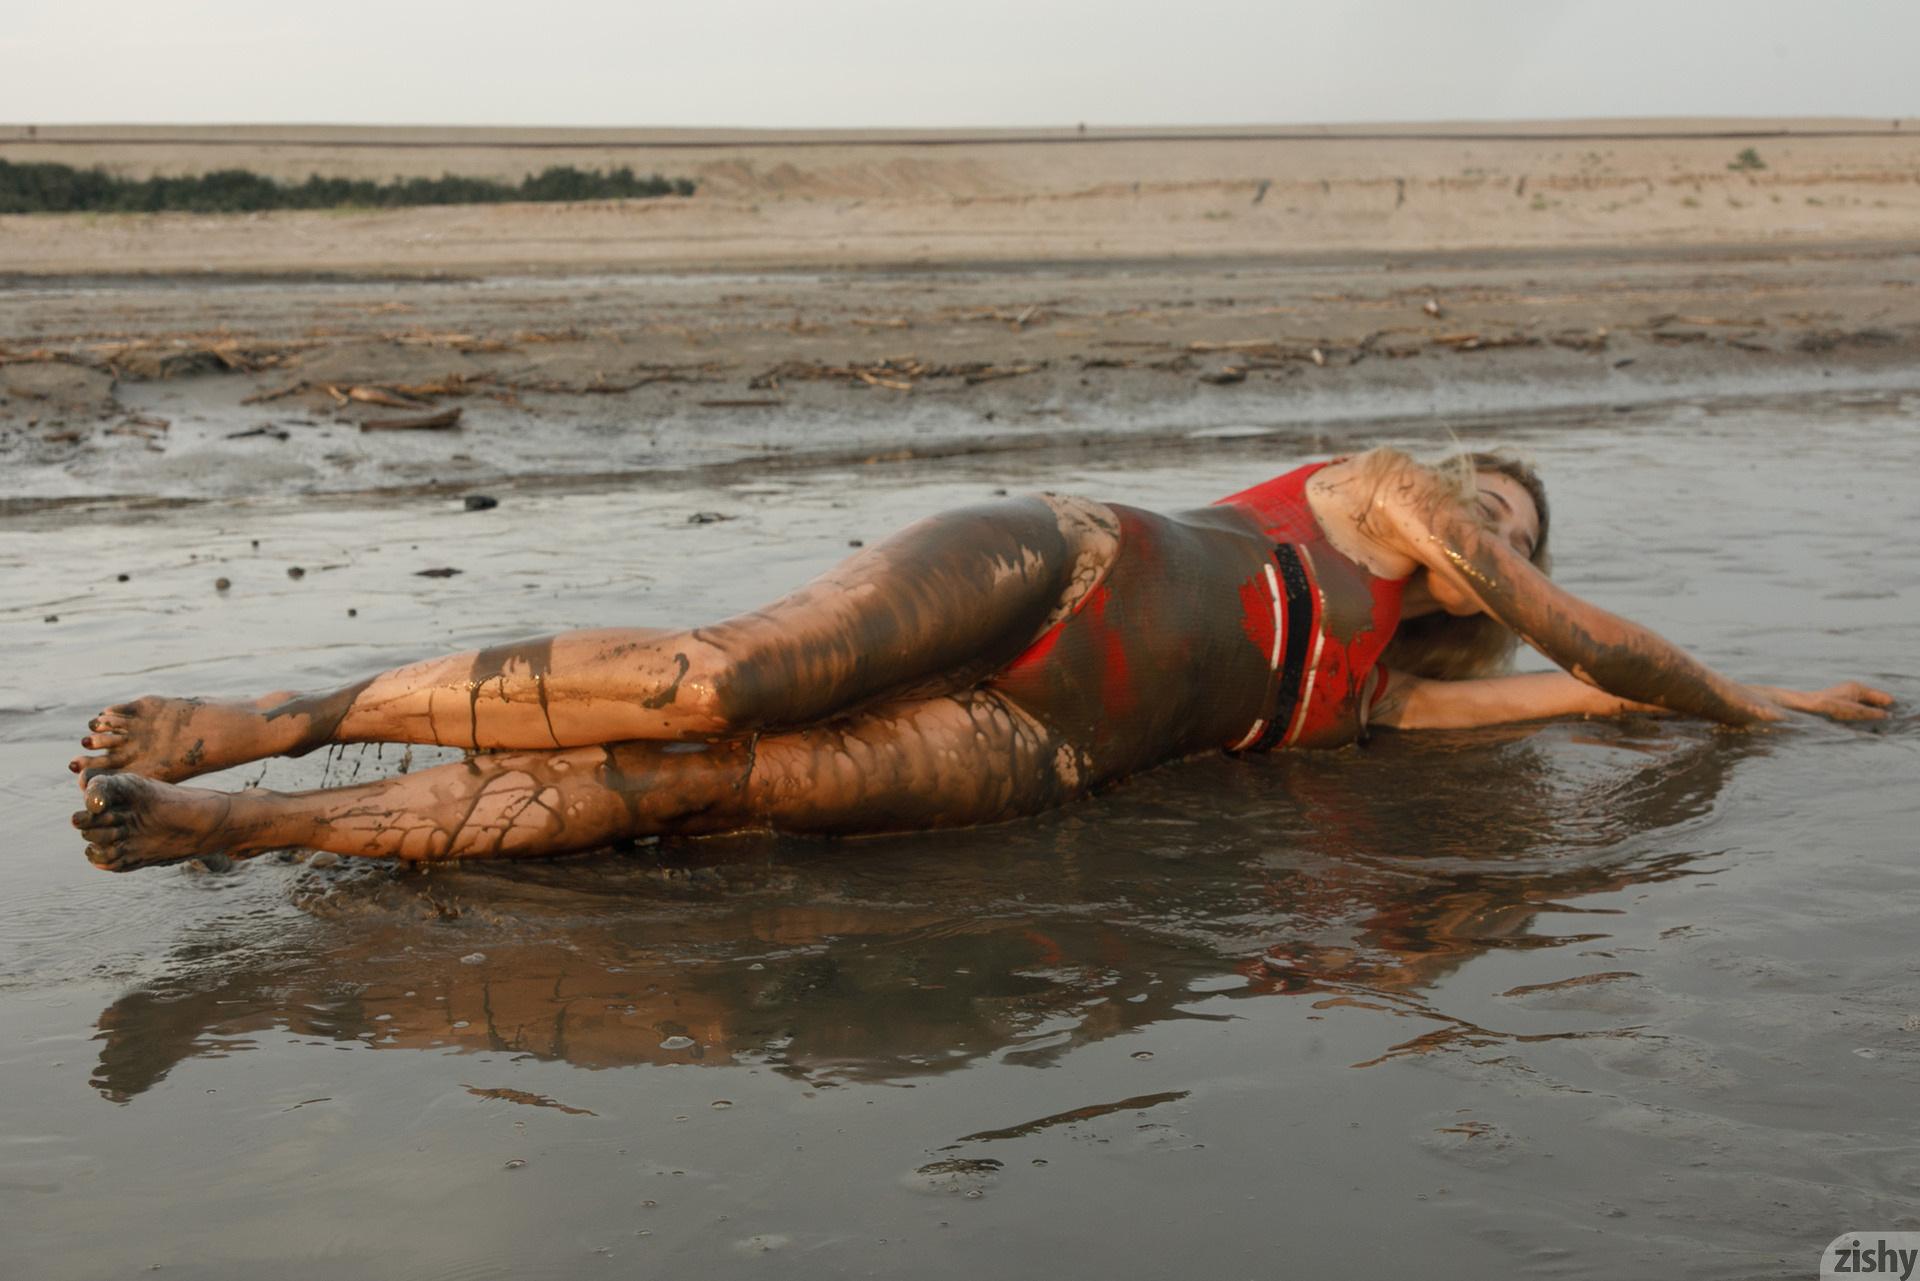 Sofia Orlova On Gryaznyy Beach Zishy (21)